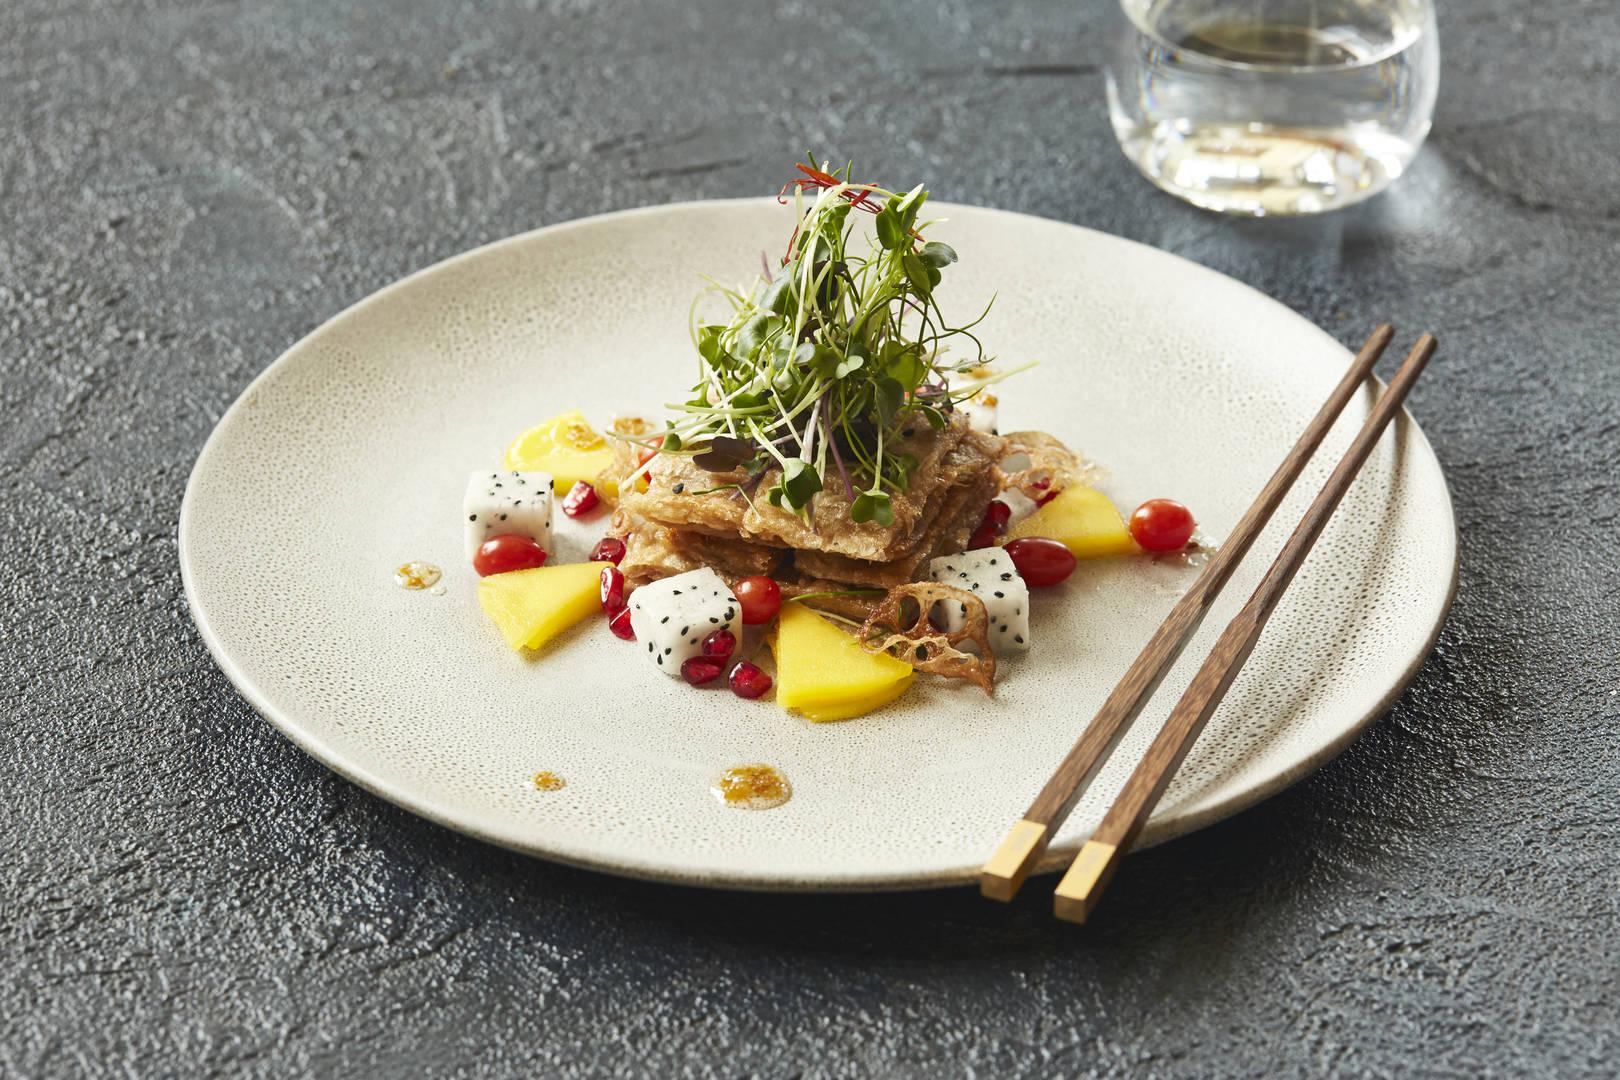 https://cdn.jumeirah.com/-/mediadh/DH/Hospitality/Jumeirah/Restaurants/Dubai/Mina-A-Salam-Zheng-Hes/Restaurant-Gallery/Jumeirah-Mina-ASalam--Zheng-Hes--Crispy-Bean-Curd-Salad--Landscape.jpg?h=1080&w=1620&hash=E2D3DEABB32E493AA3C11D43DC445C03